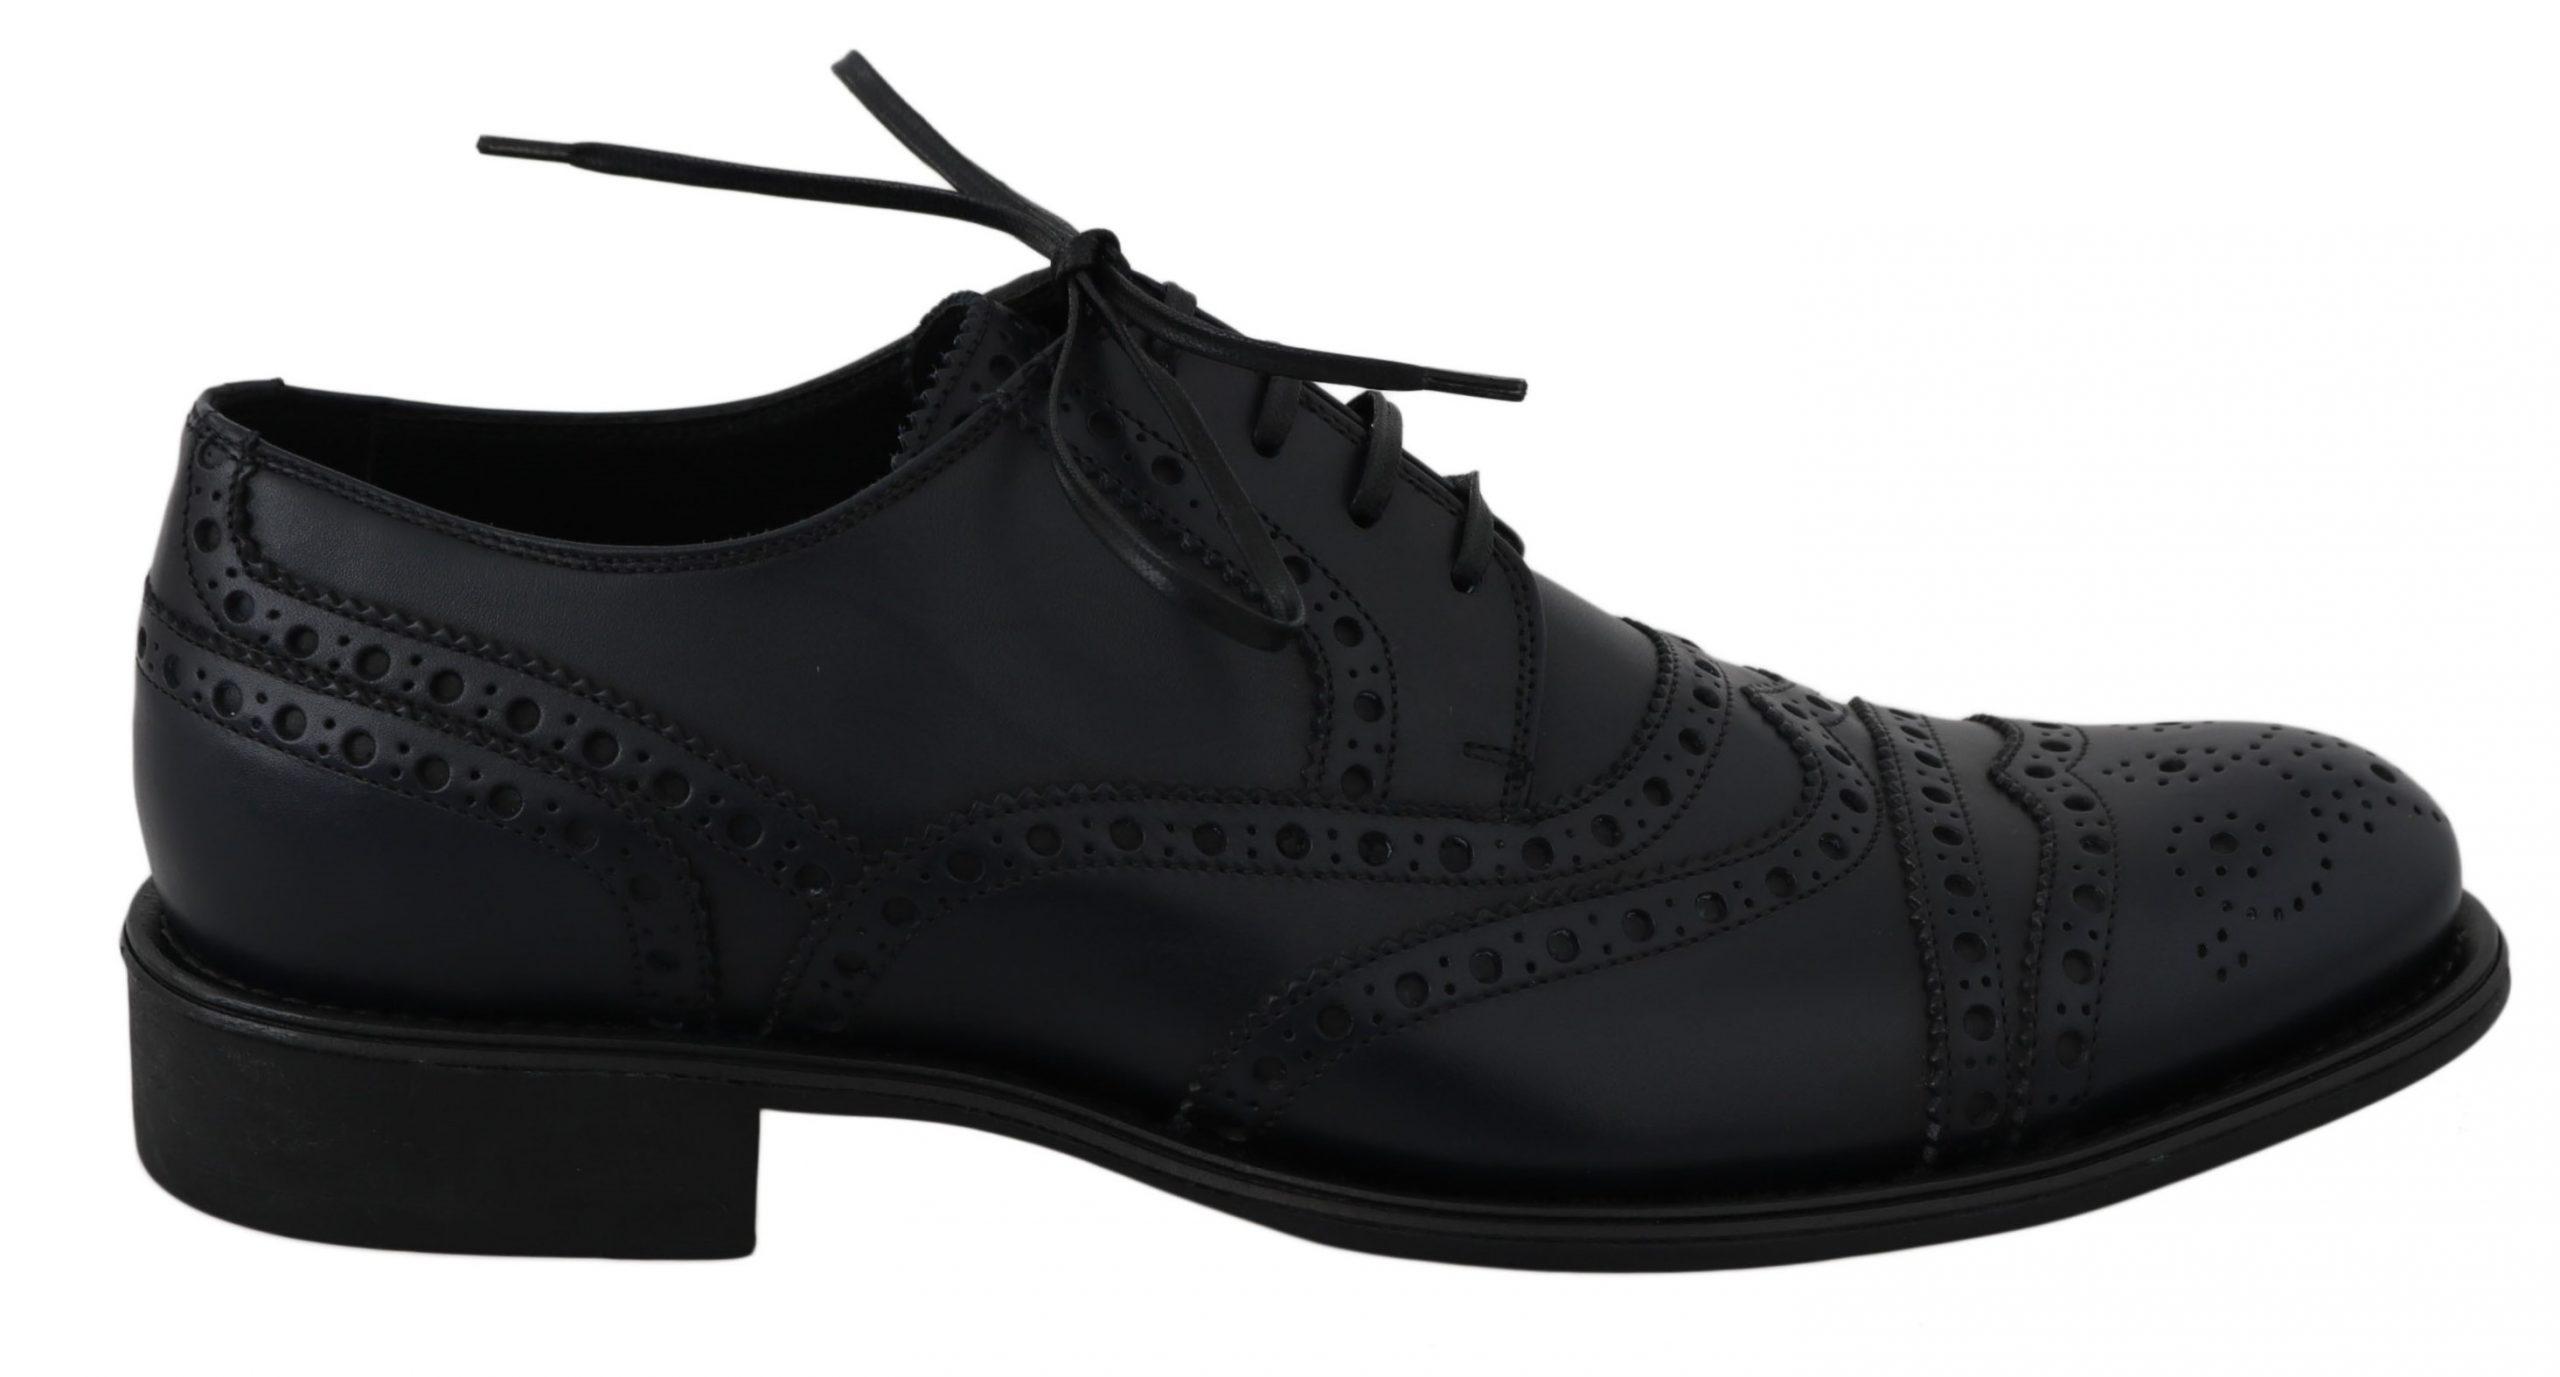 Dolce & Gabbana Men's Shoes Blue MV2334 - EU39/US6